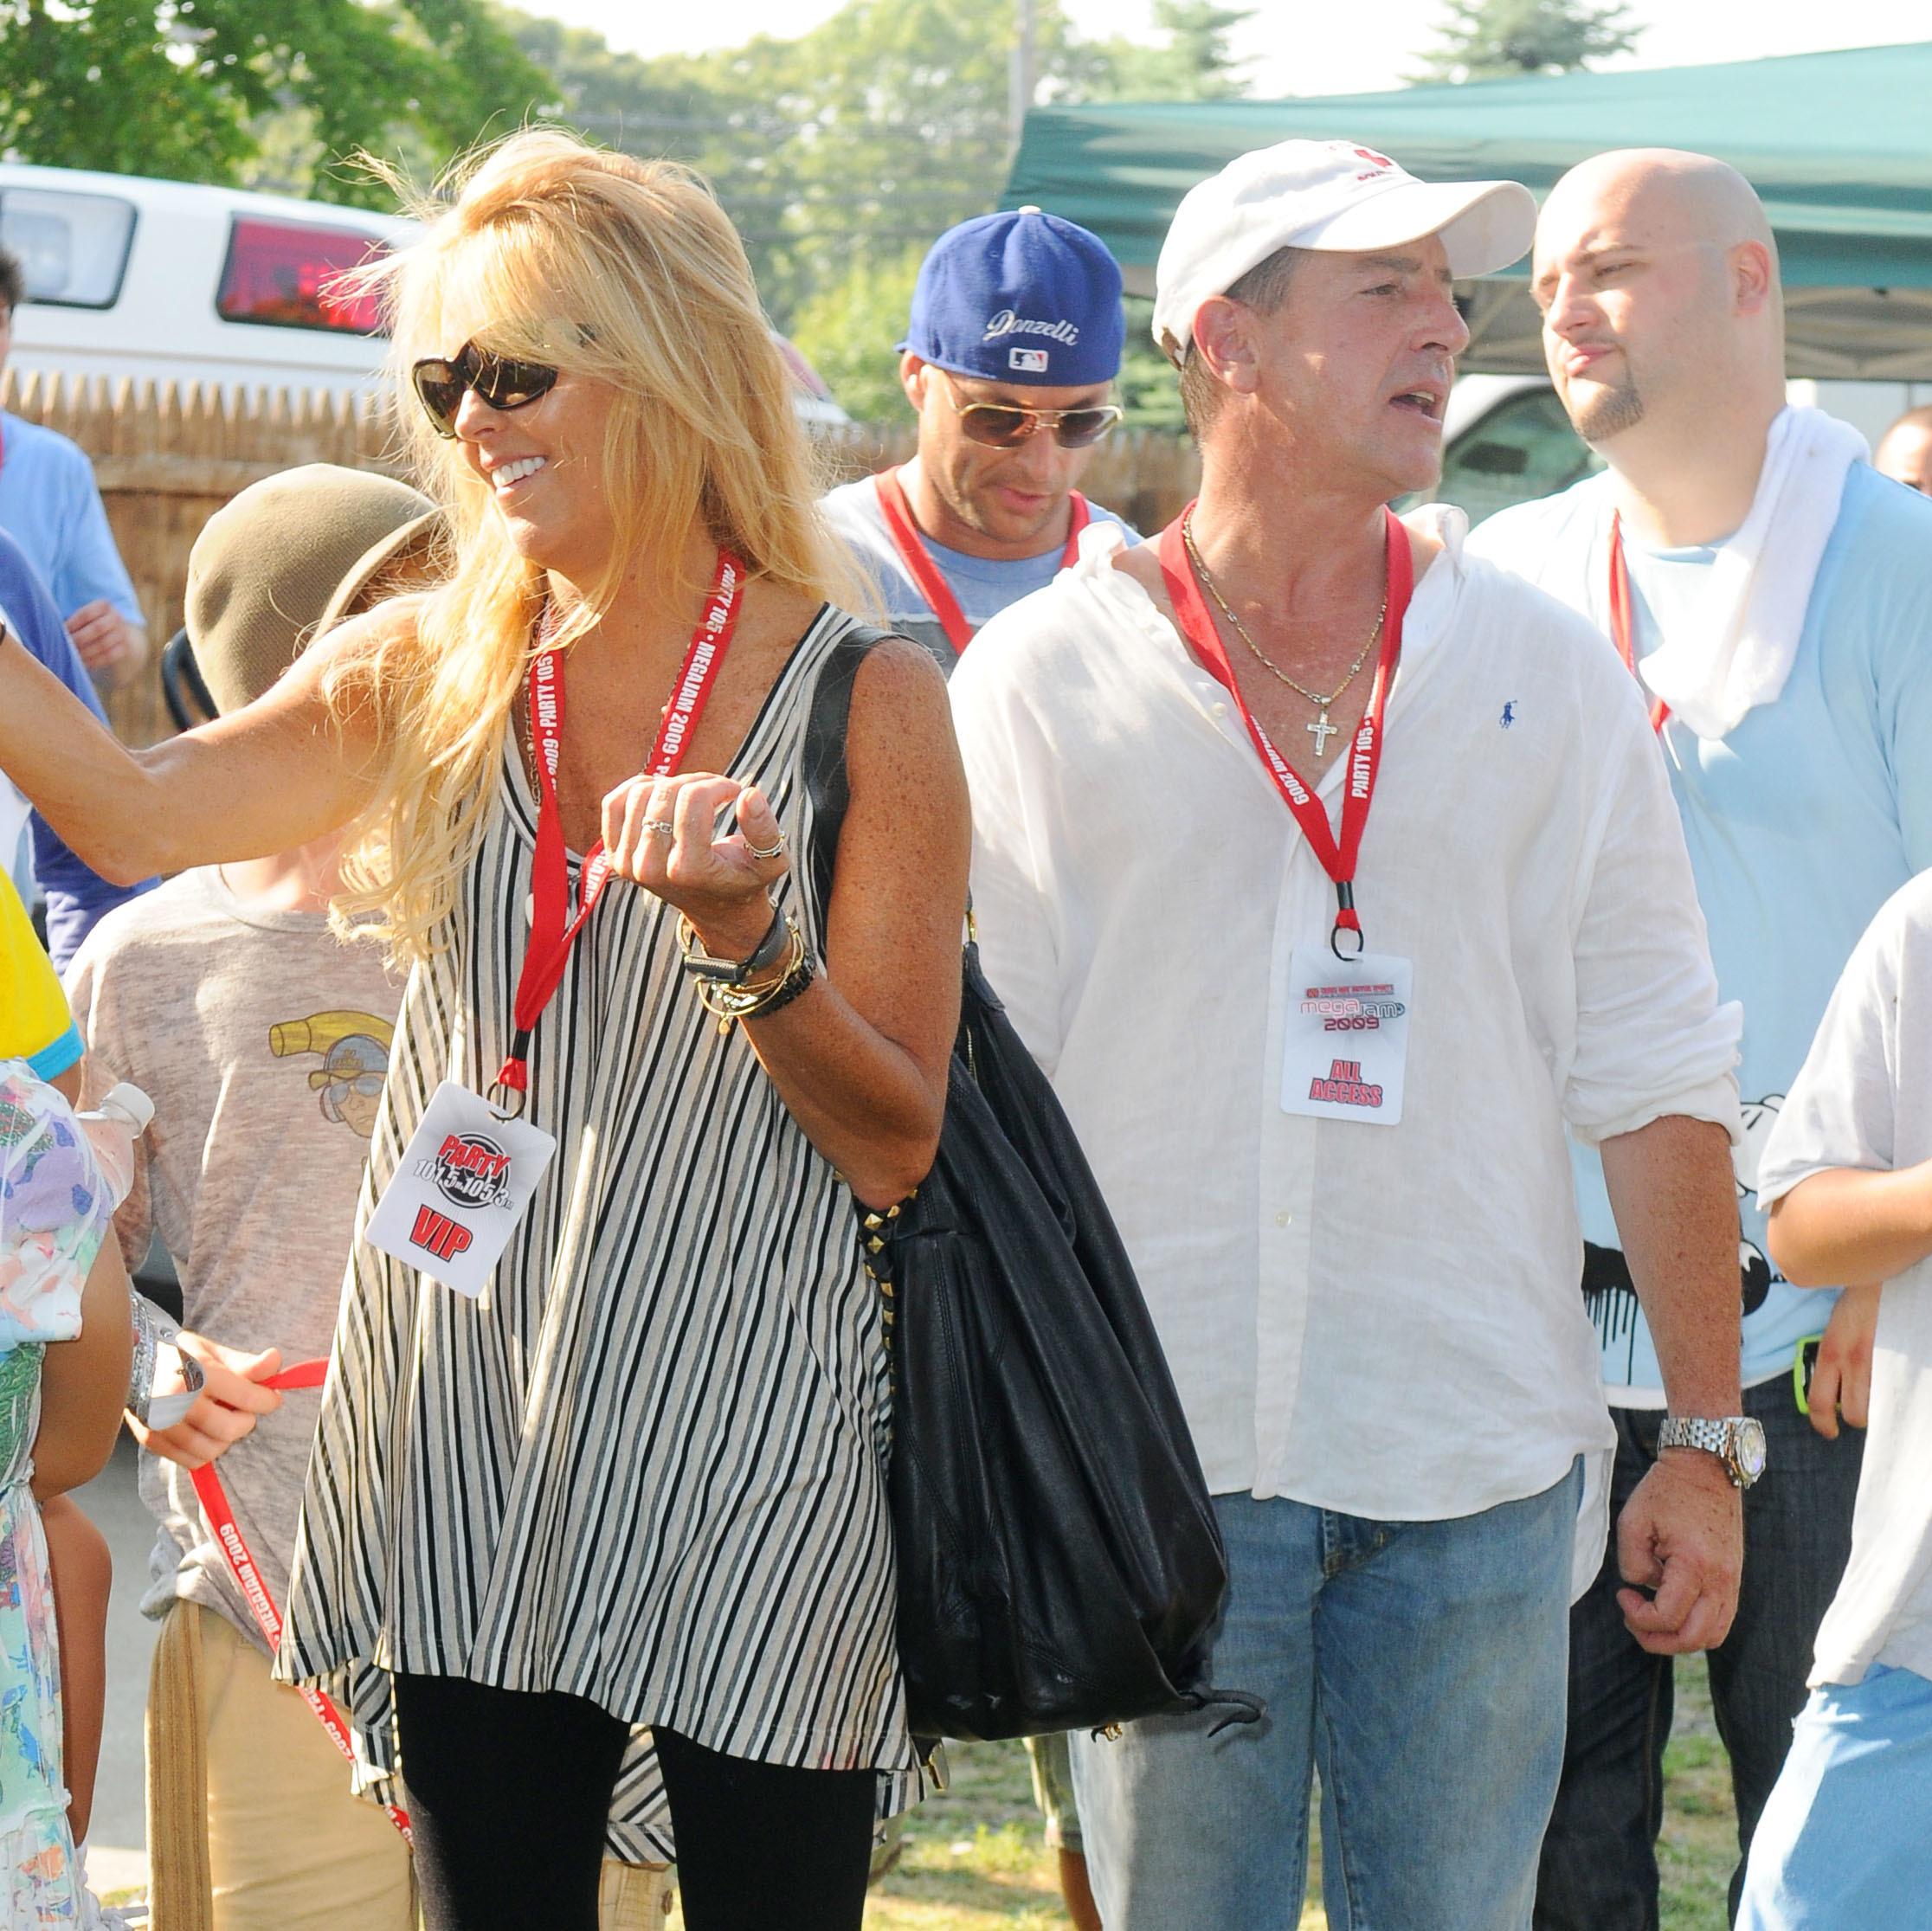 Dina and Michael Lohan head to reality TV to make amends